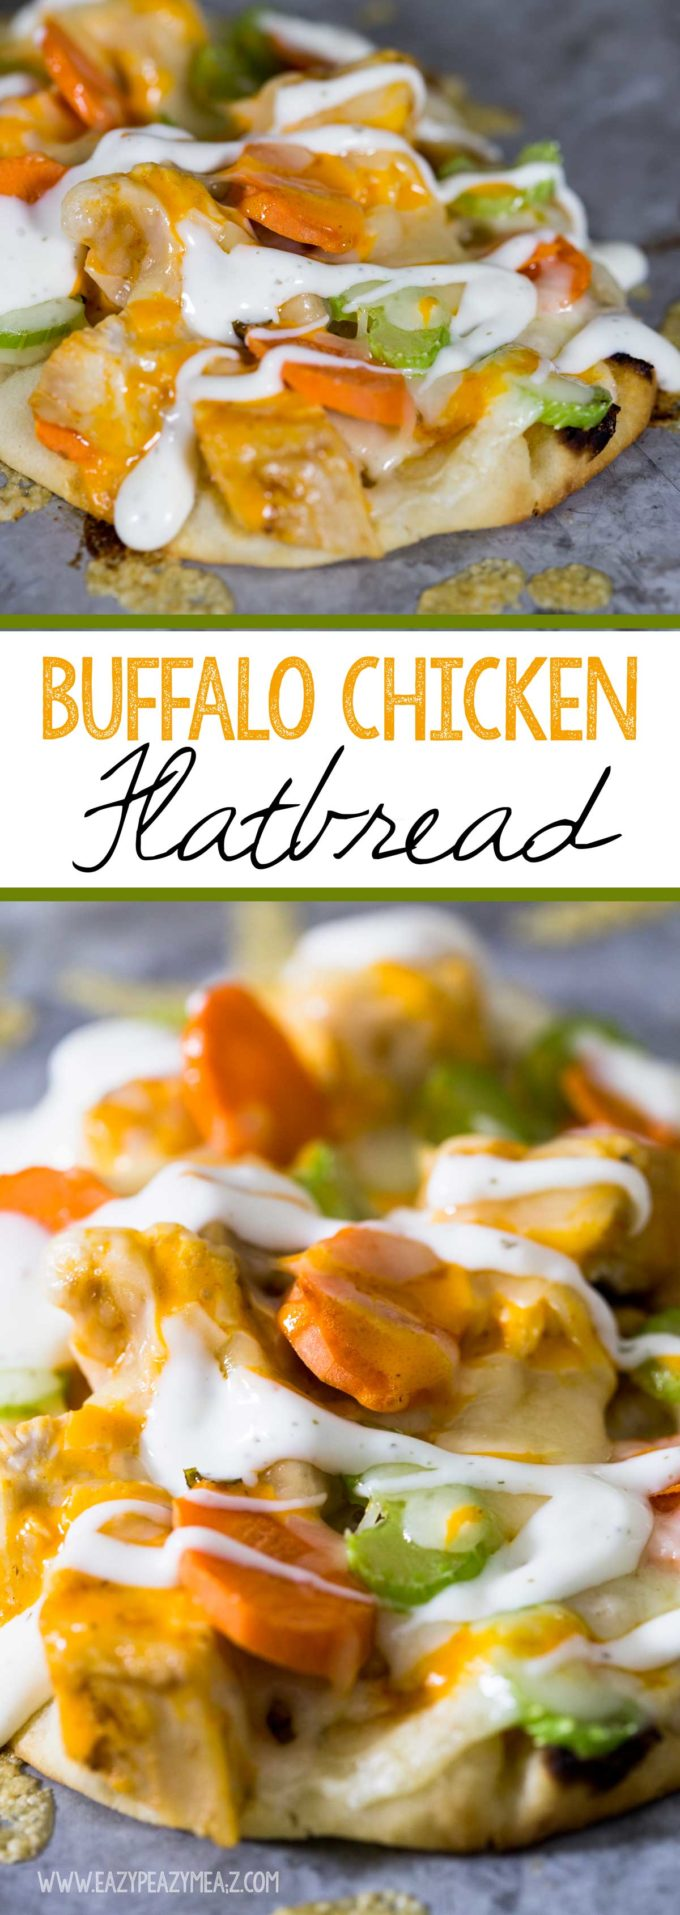 pin-buffalo-chicken-flatbread